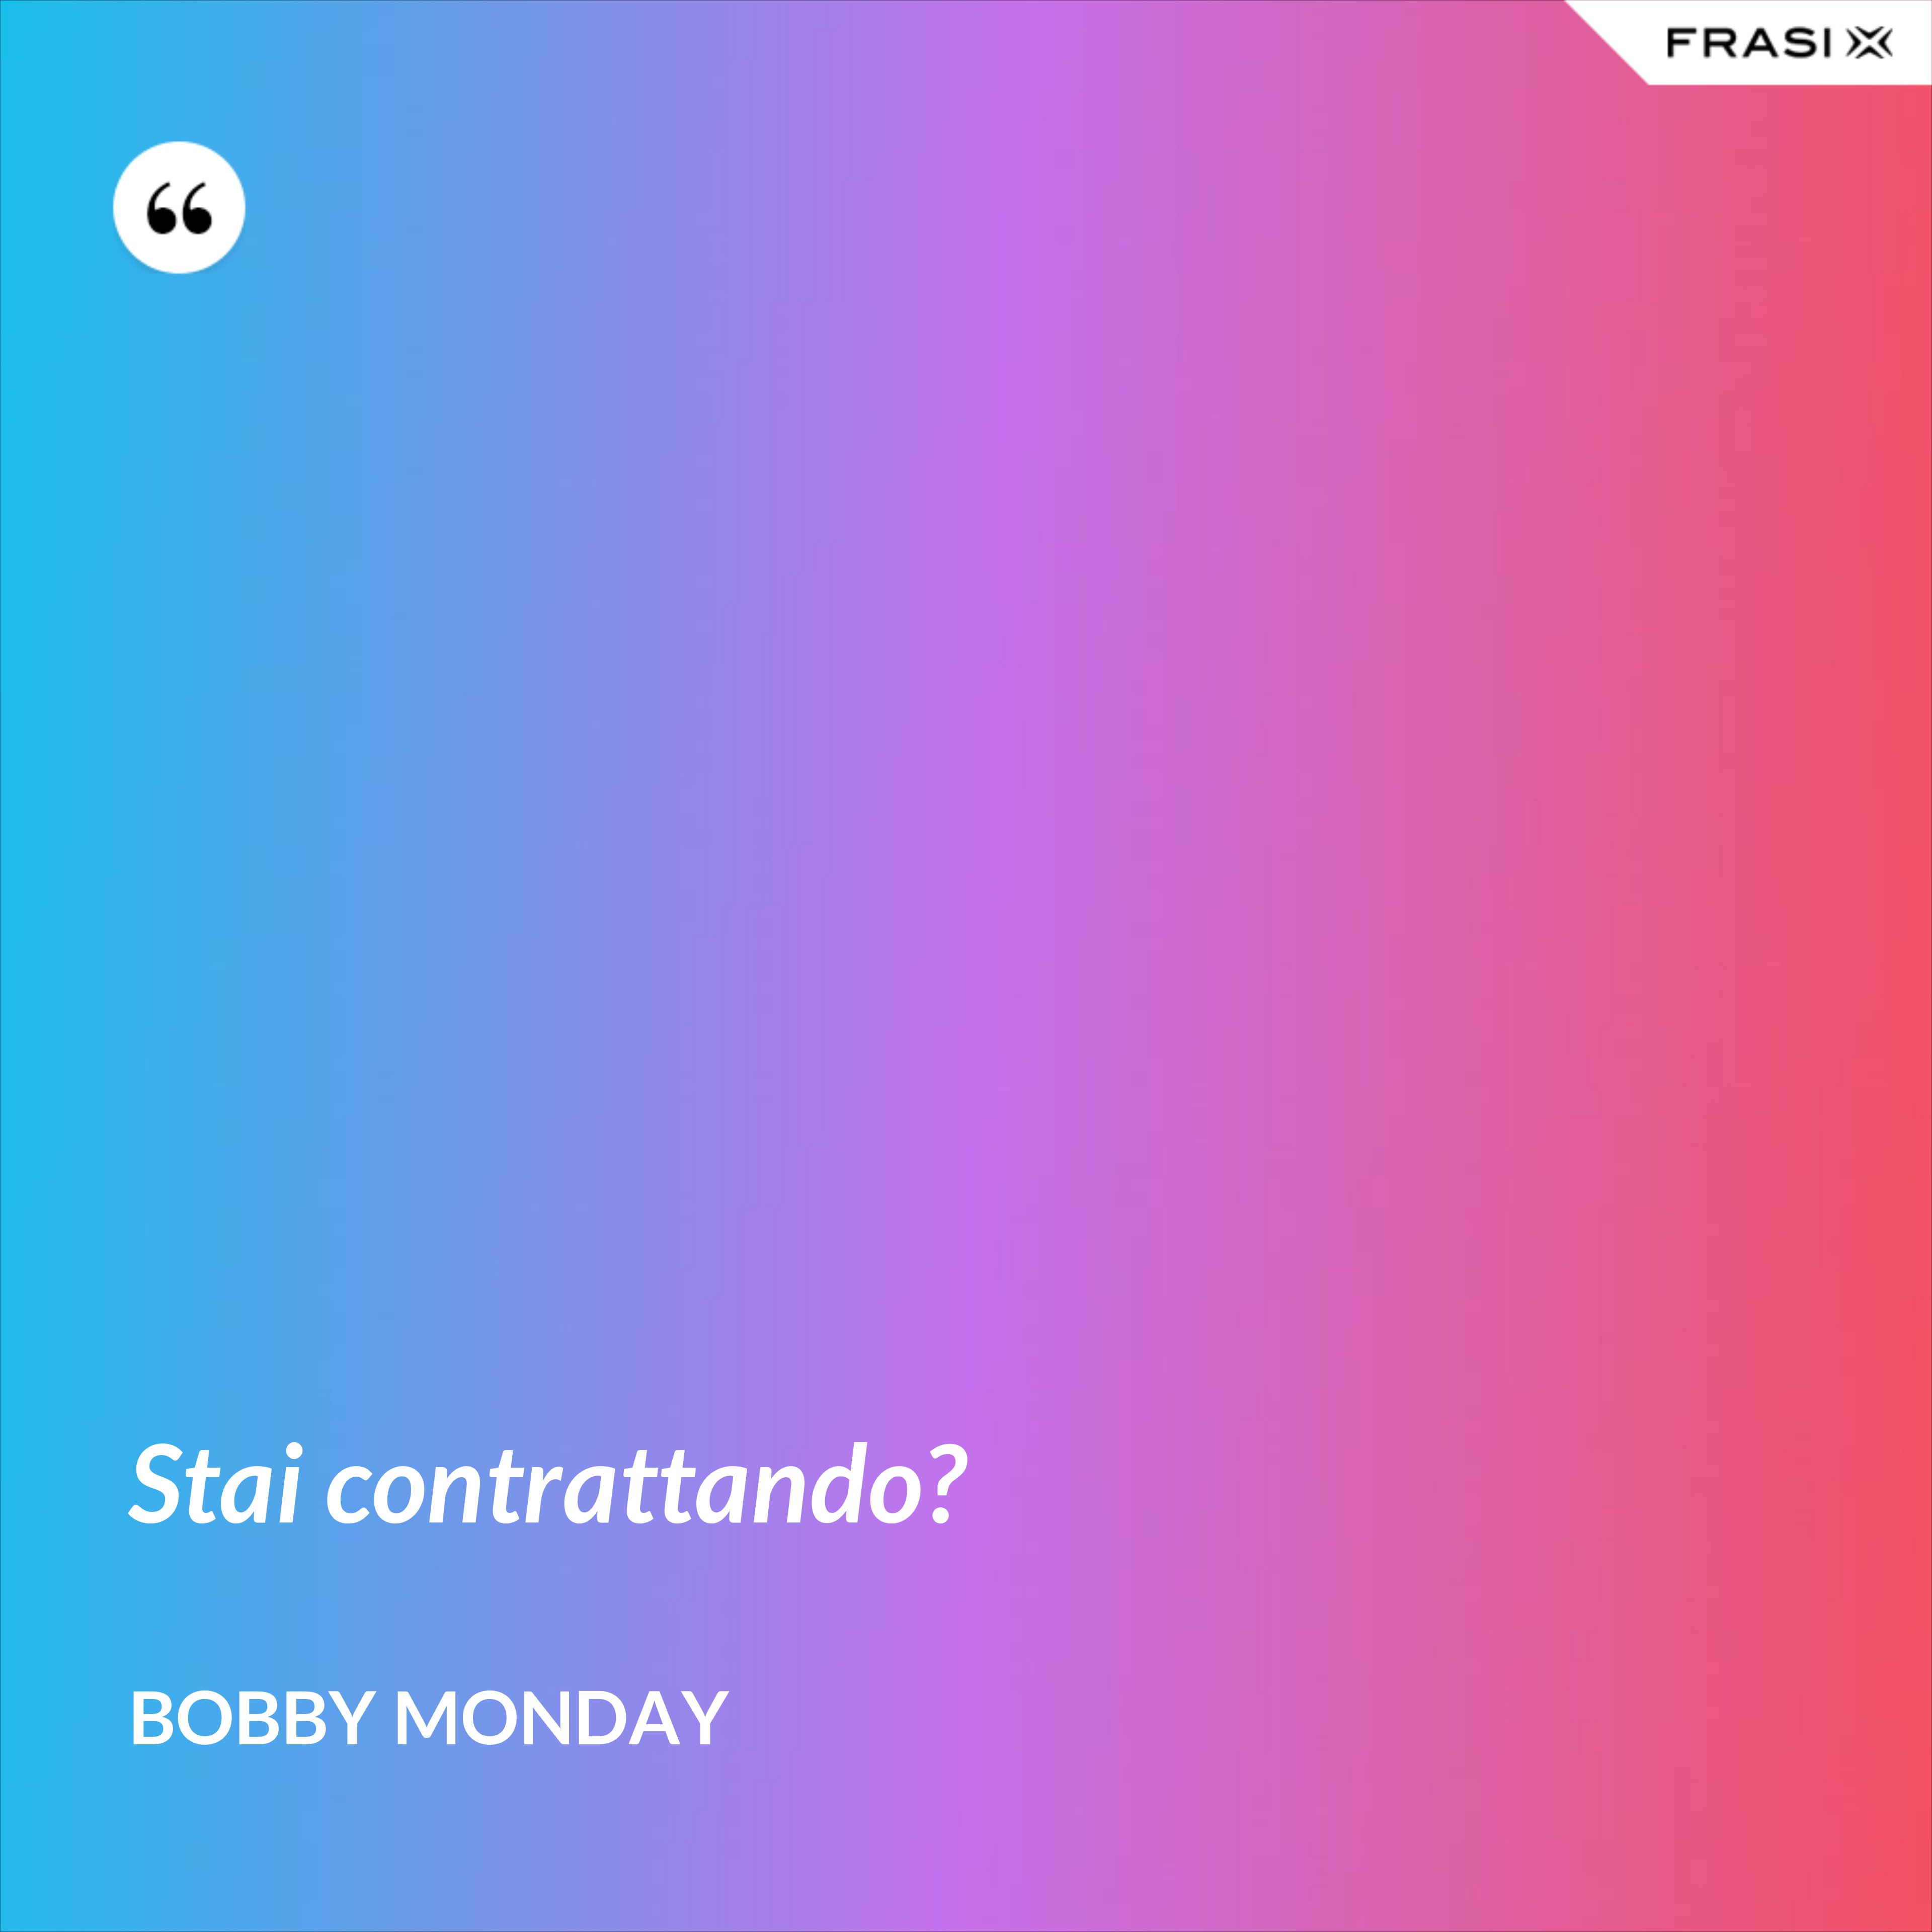 Stai contrattando? - Bobby Monday